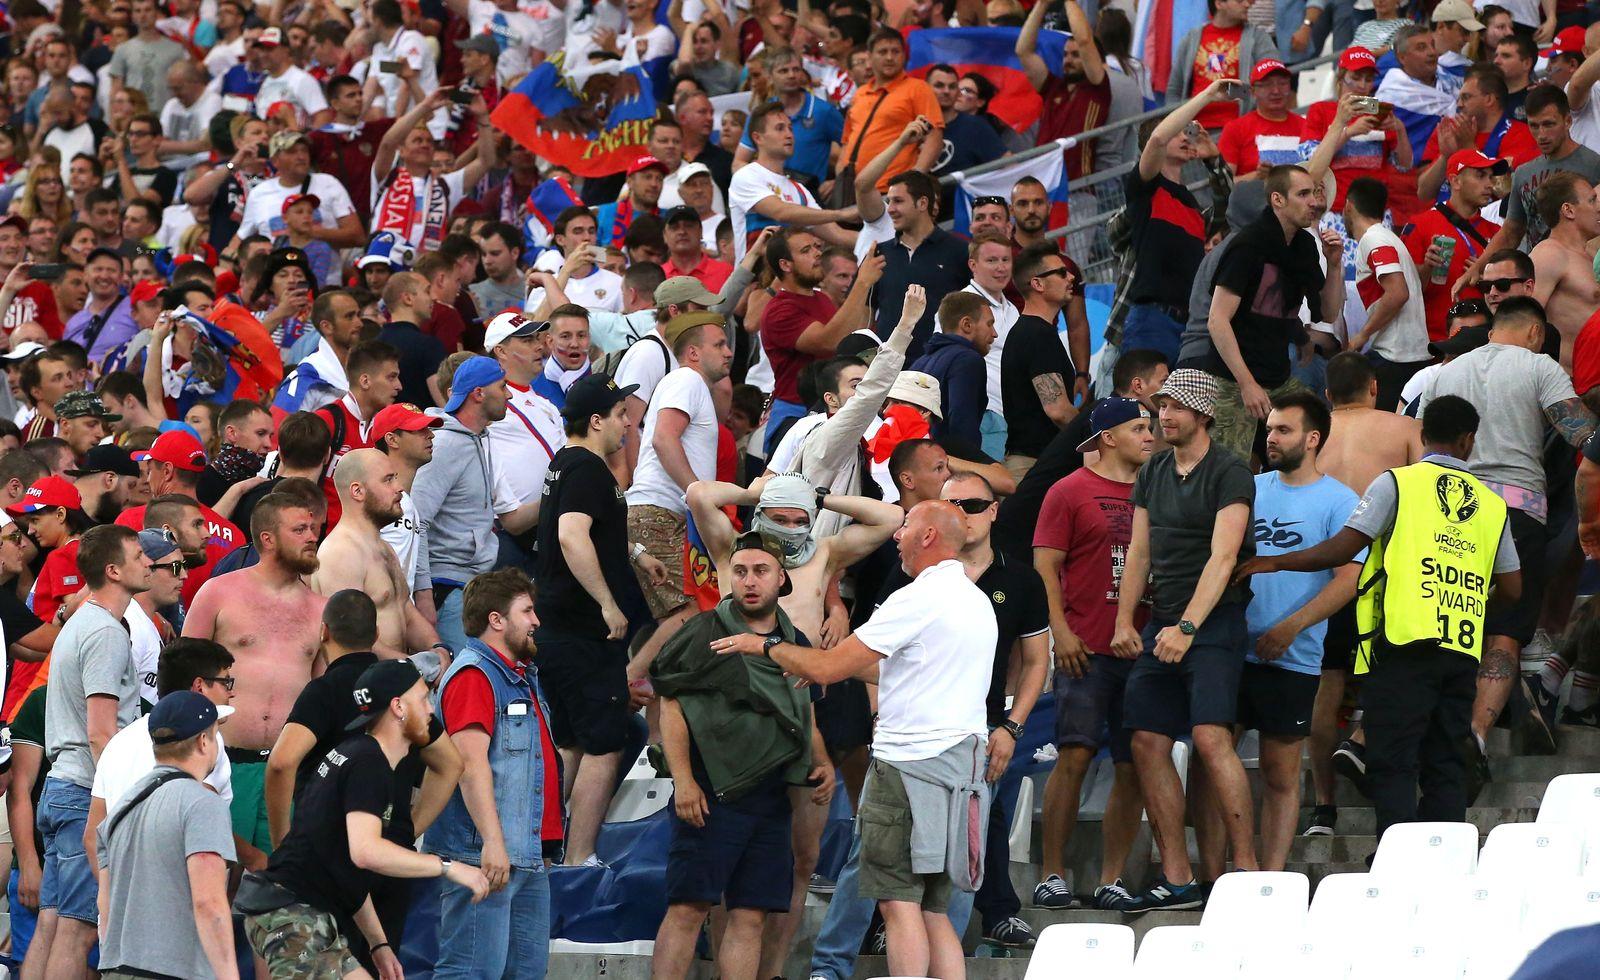 Hooligans/ Fans/ Krawalle/ England vs Russland/ EURO 2016